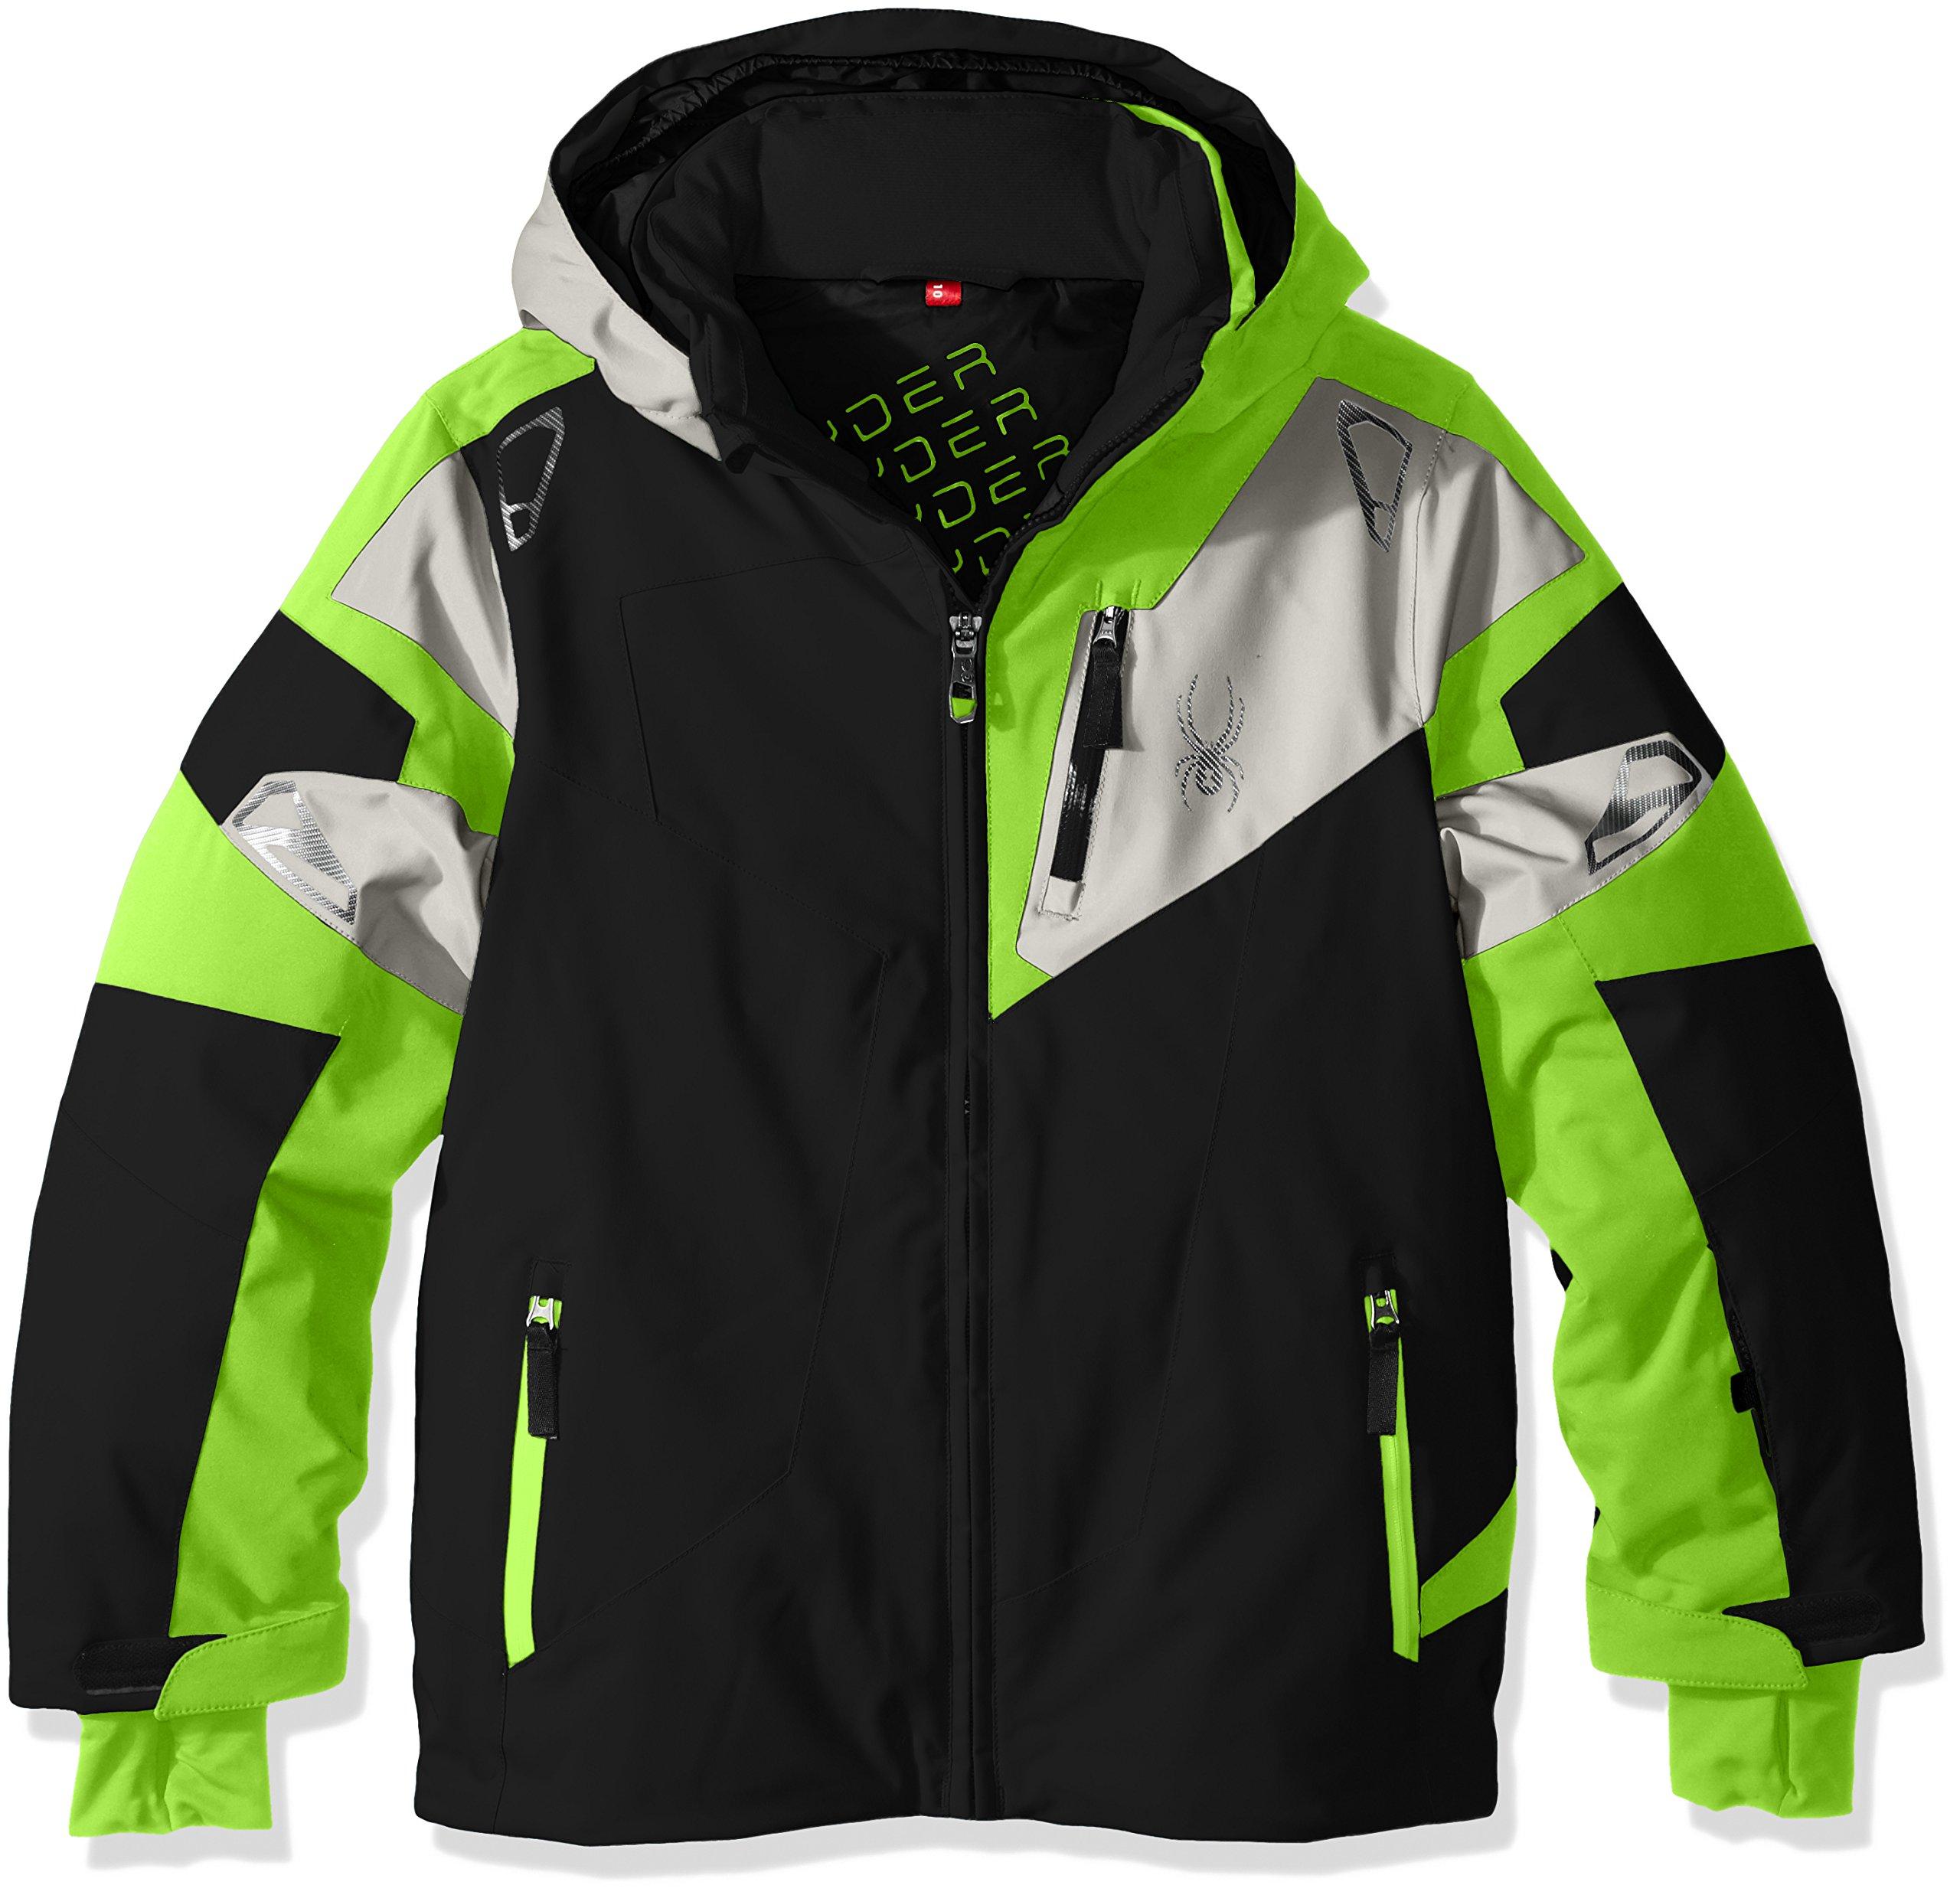 Spyder Boys Leader Jacket, Size 18, Black/Bryte Green/Cirrus by Spyder